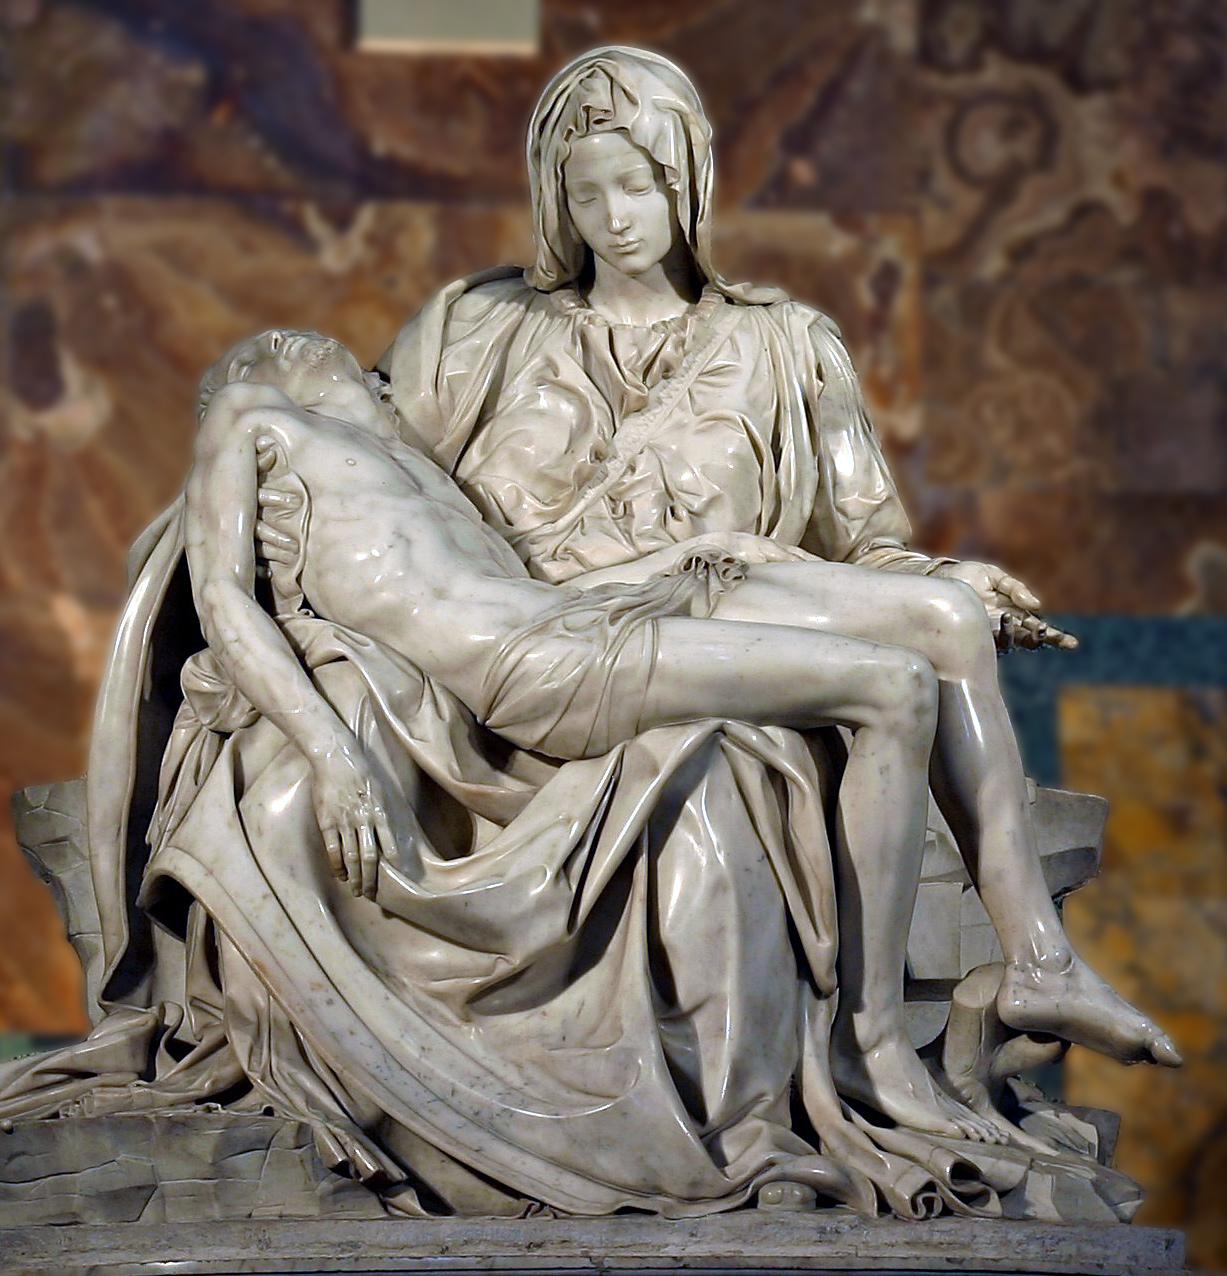 La maquette de la Pietà